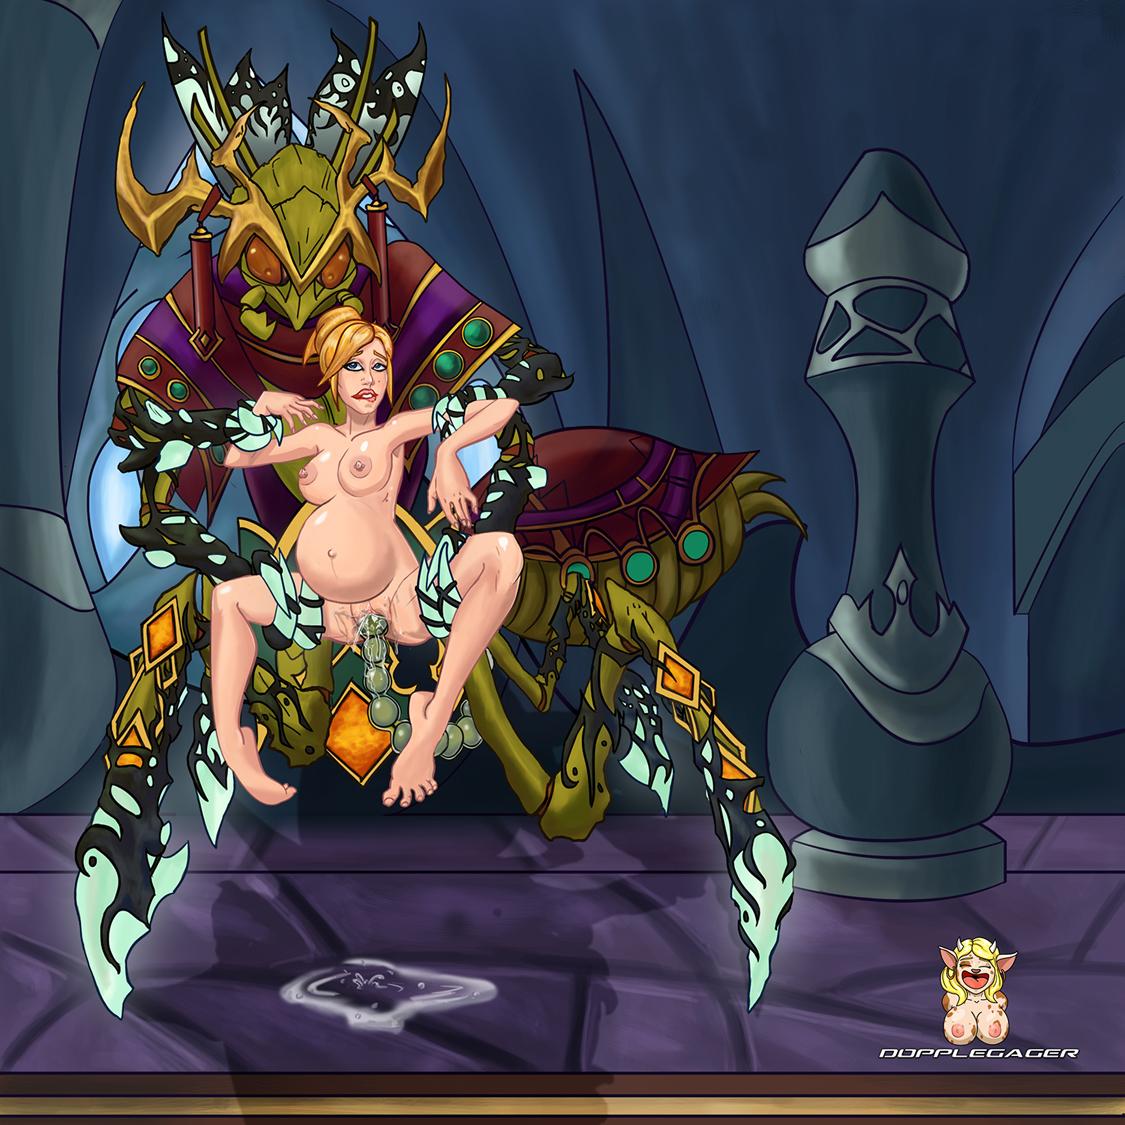 Trisha goddard nude